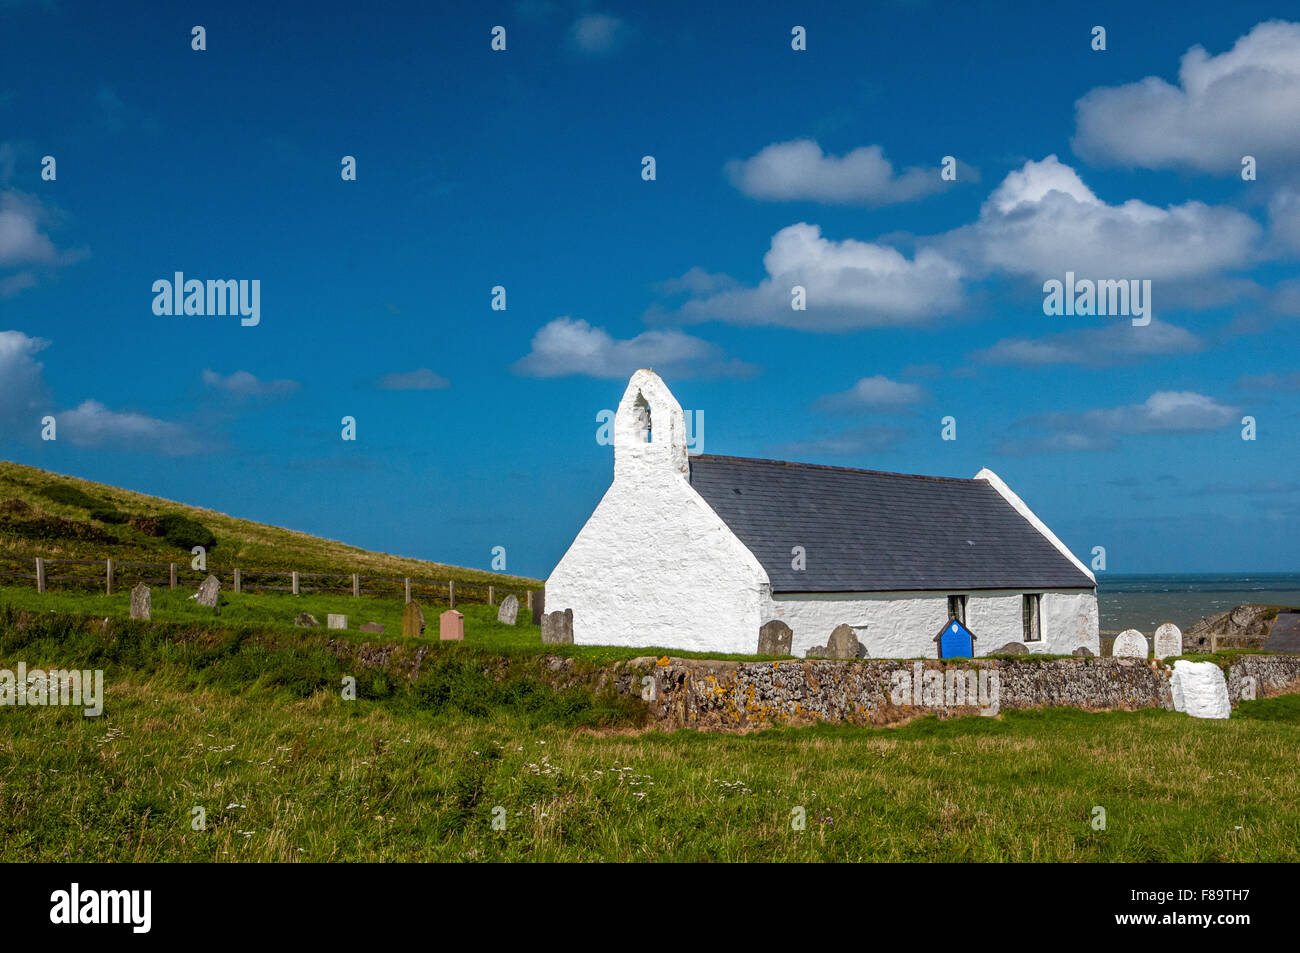 Mwnt Church on the Ceredigion, or Cardiganshire, Coast in West Wales, UK - Stock Image